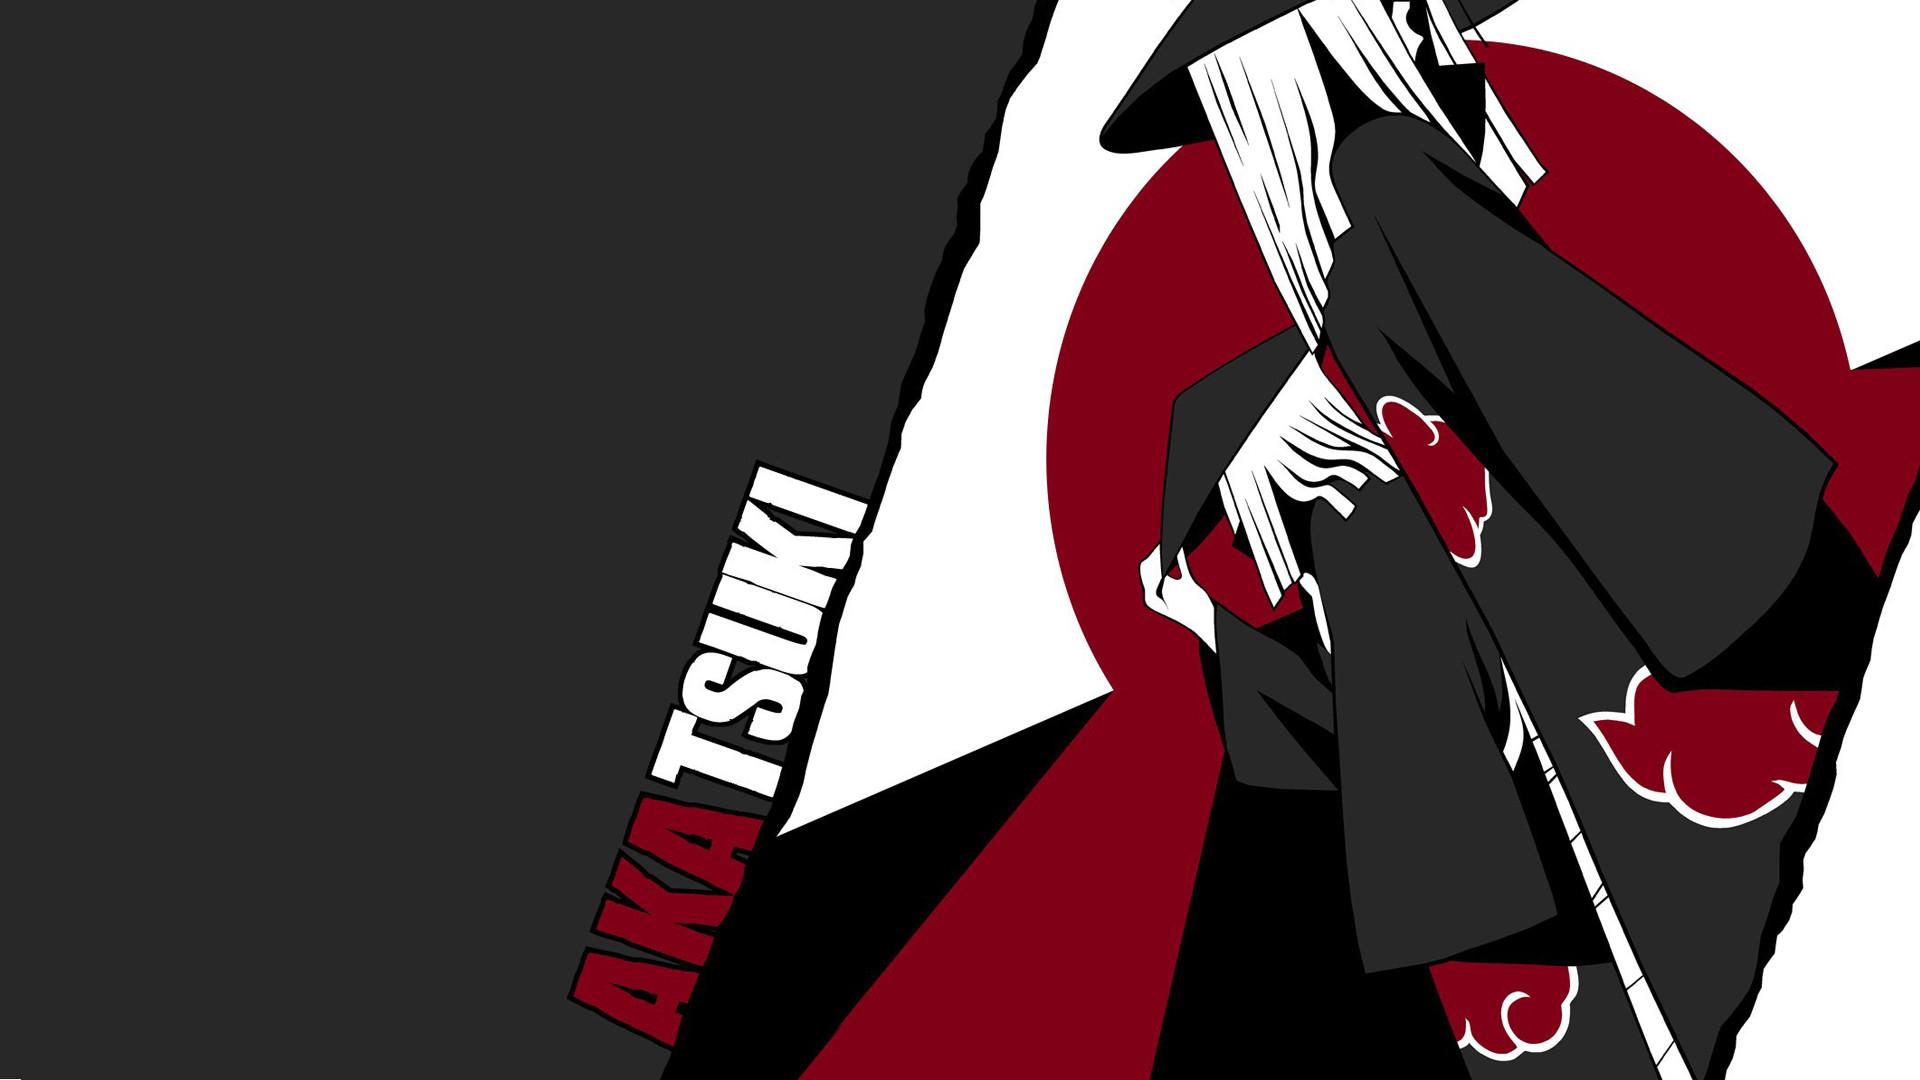 akatsuki group anime wallpaper 1080p full original .